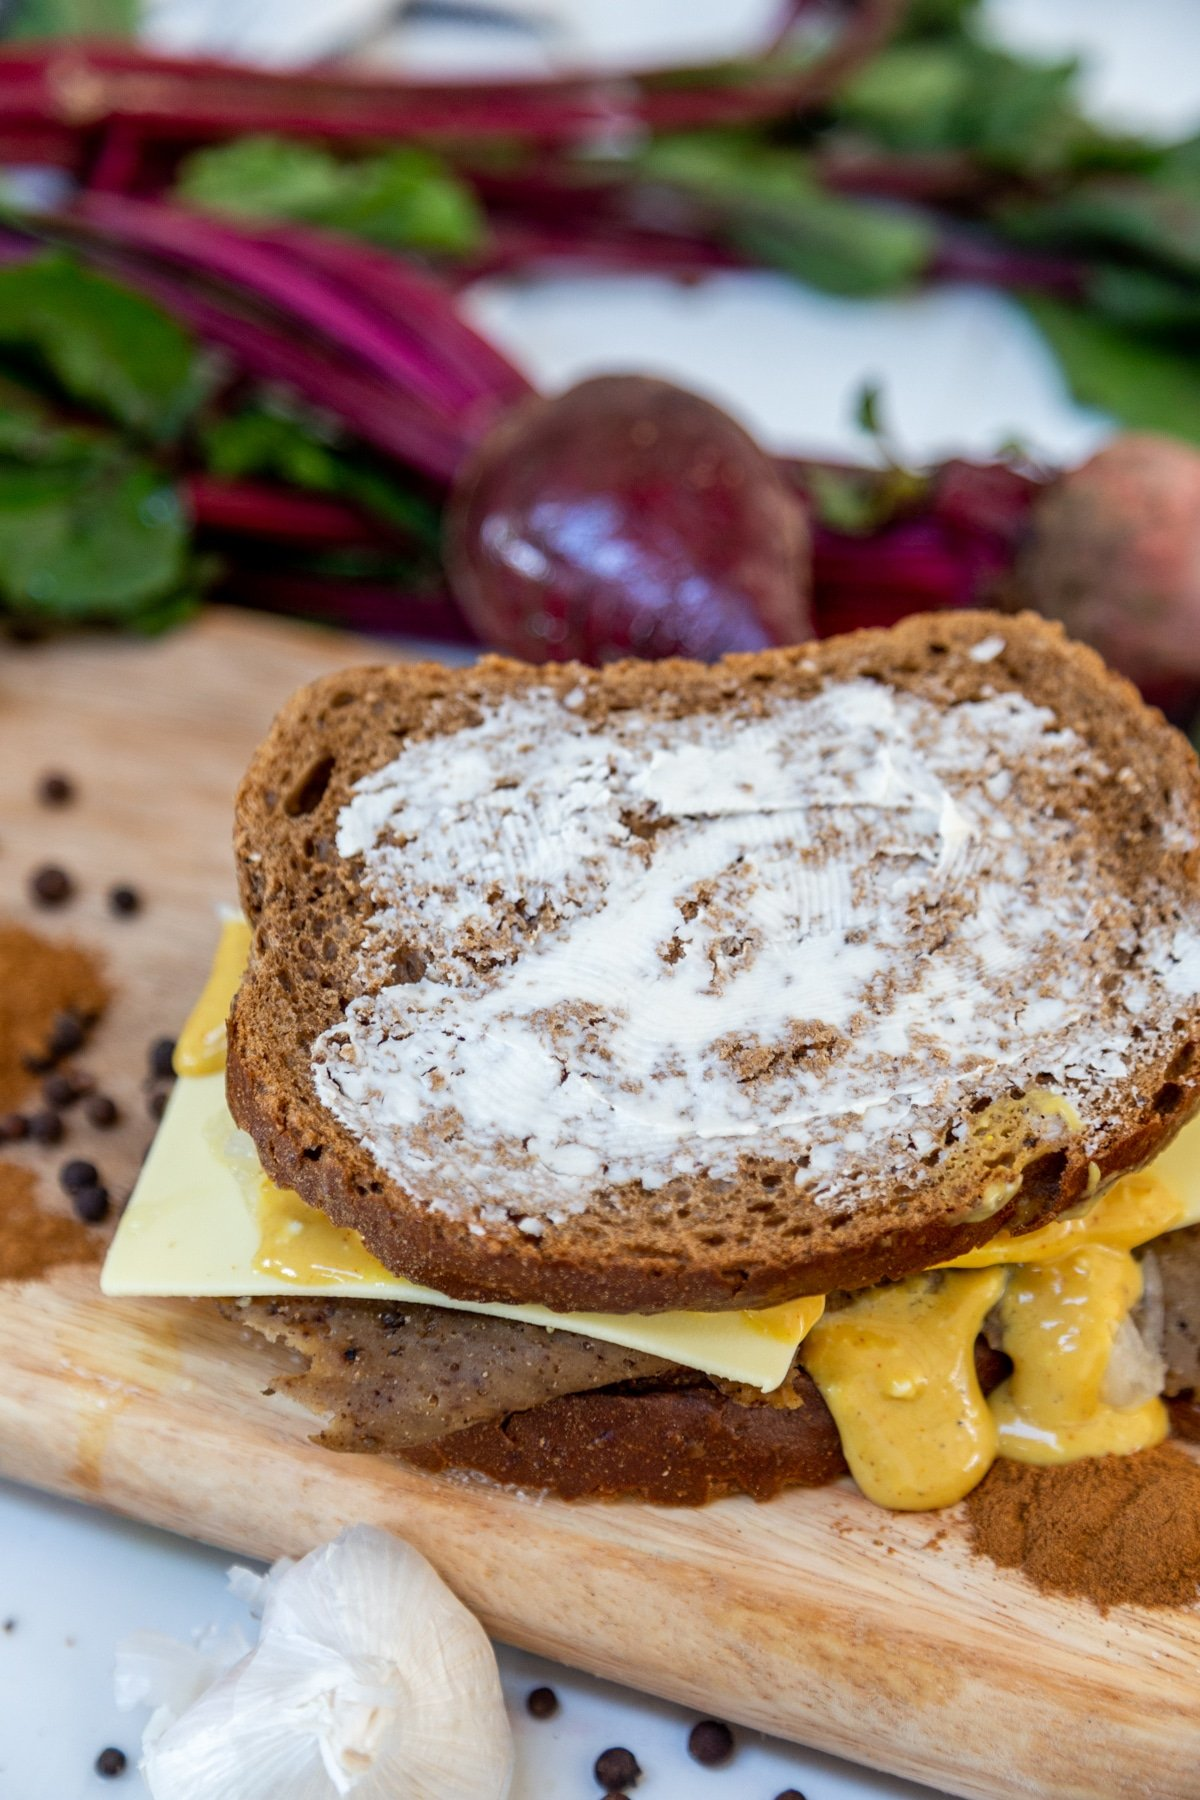 A Reuben sandwich before it's grilled.